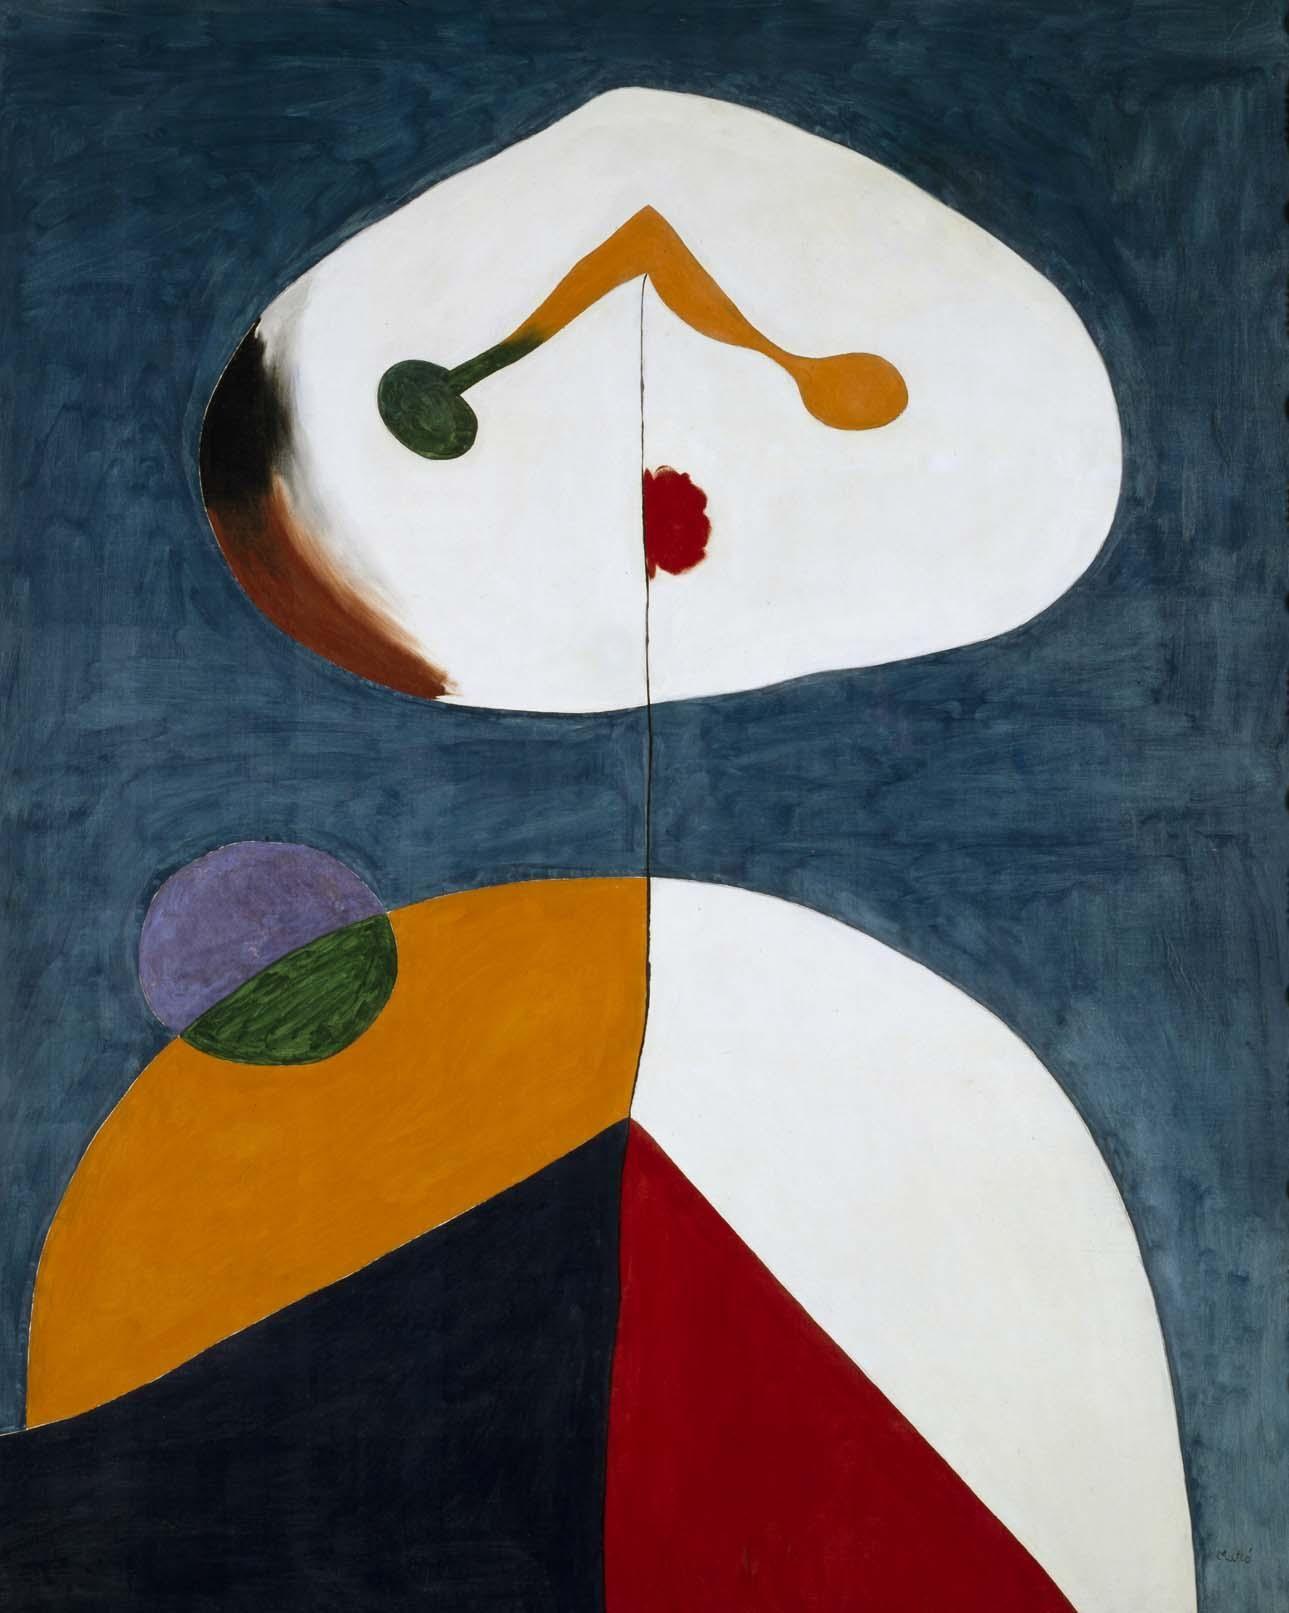 Miró Joan Portrait Ii Retrato Ii Museo Nacional Centro De Arte Reina Sofía Joan Miró Centros De Arte Arte